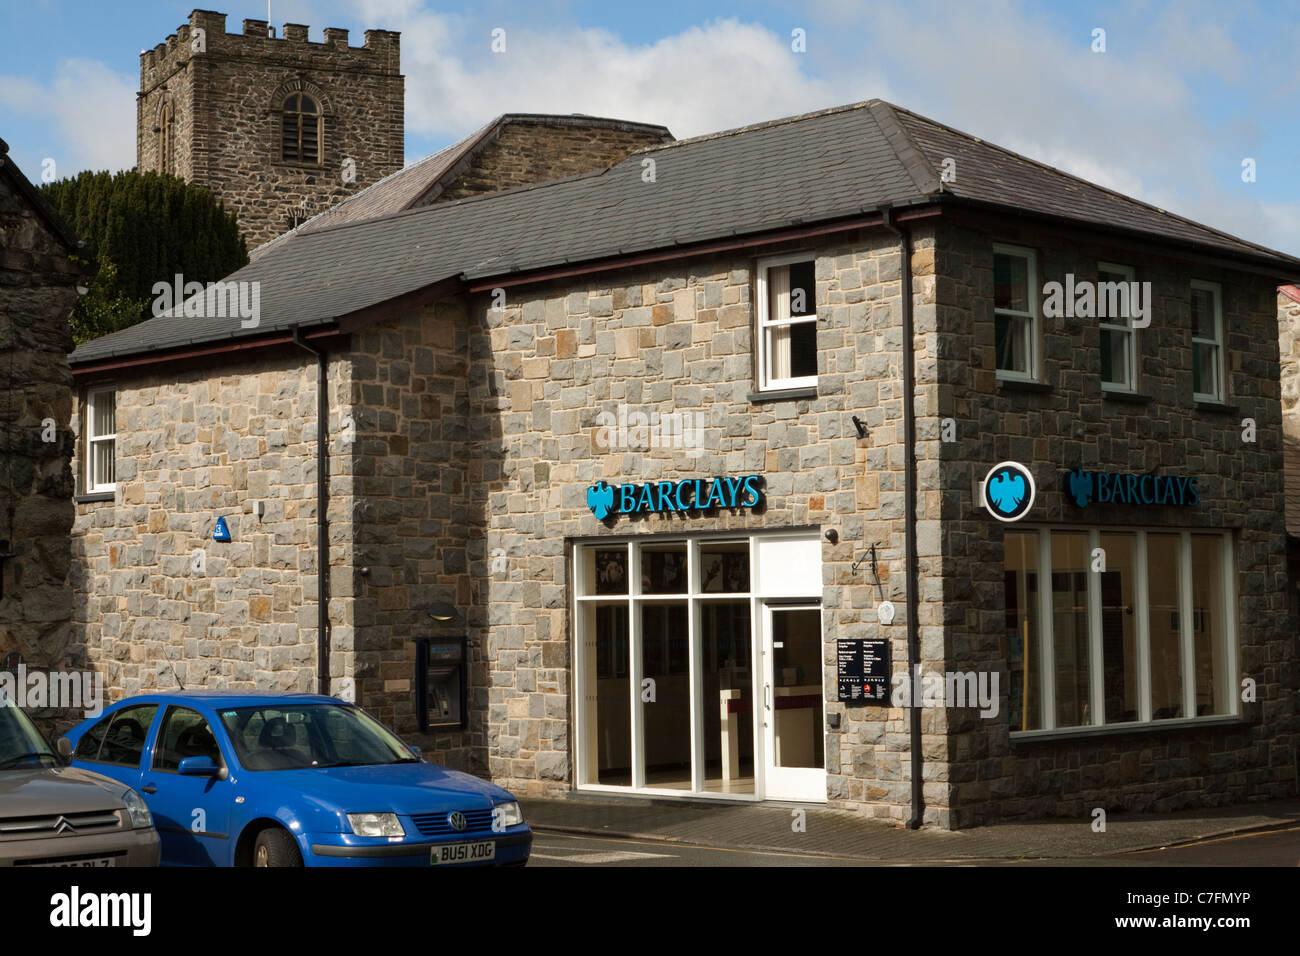 Barclays bank, Dolgellau, Wales, UK - Stock Image